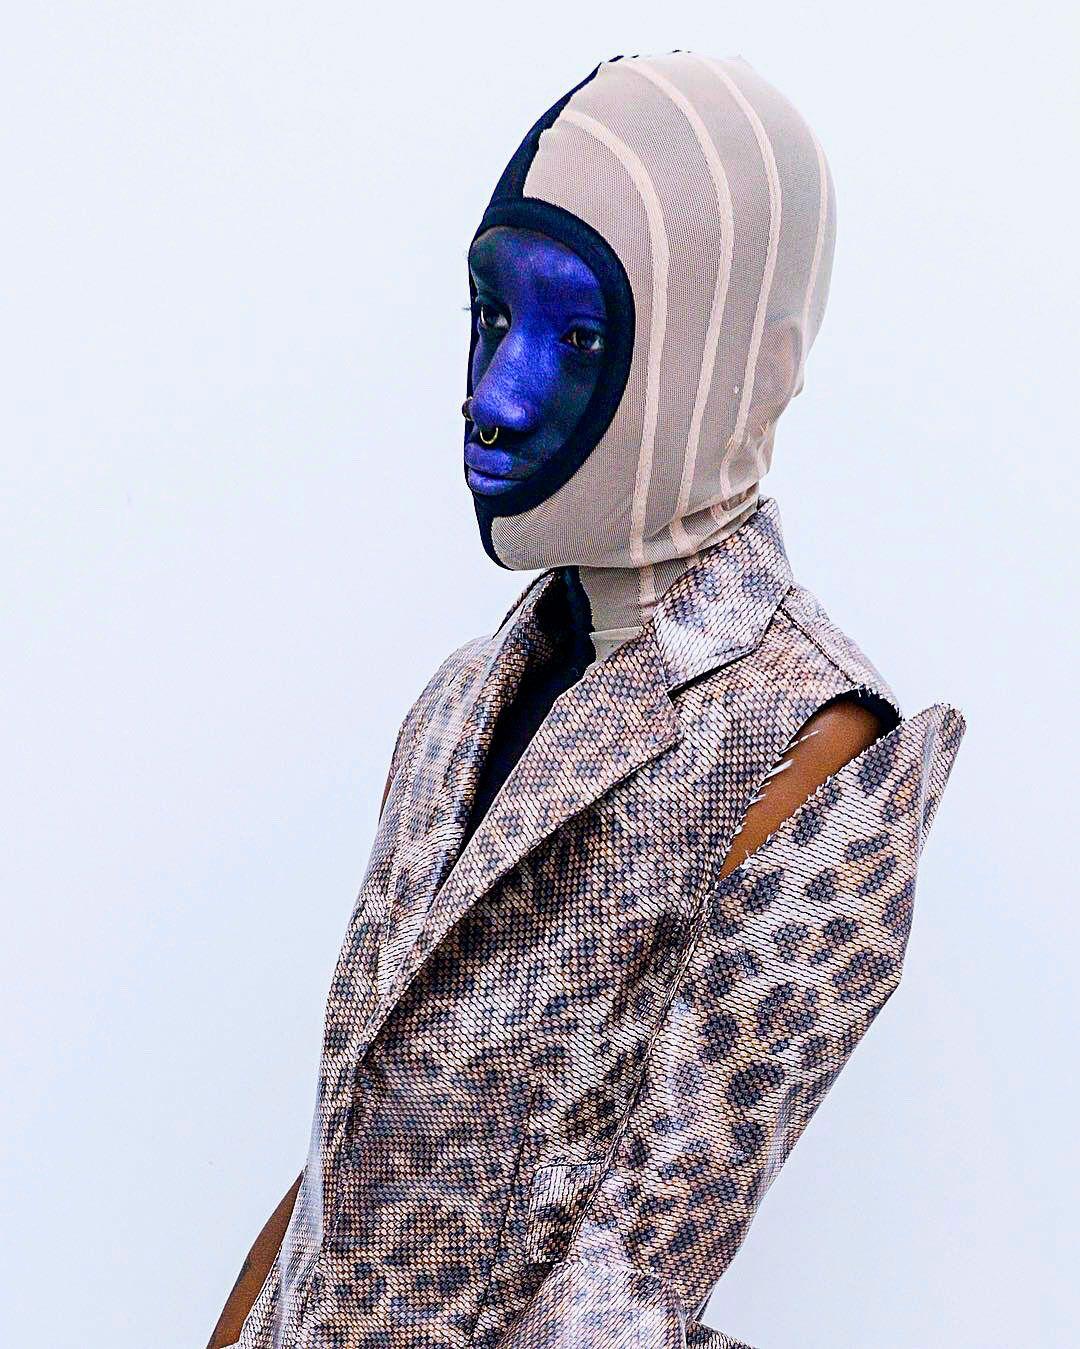 A look from Jamall Osterholm Trend I'm loving: Cheetah prints!